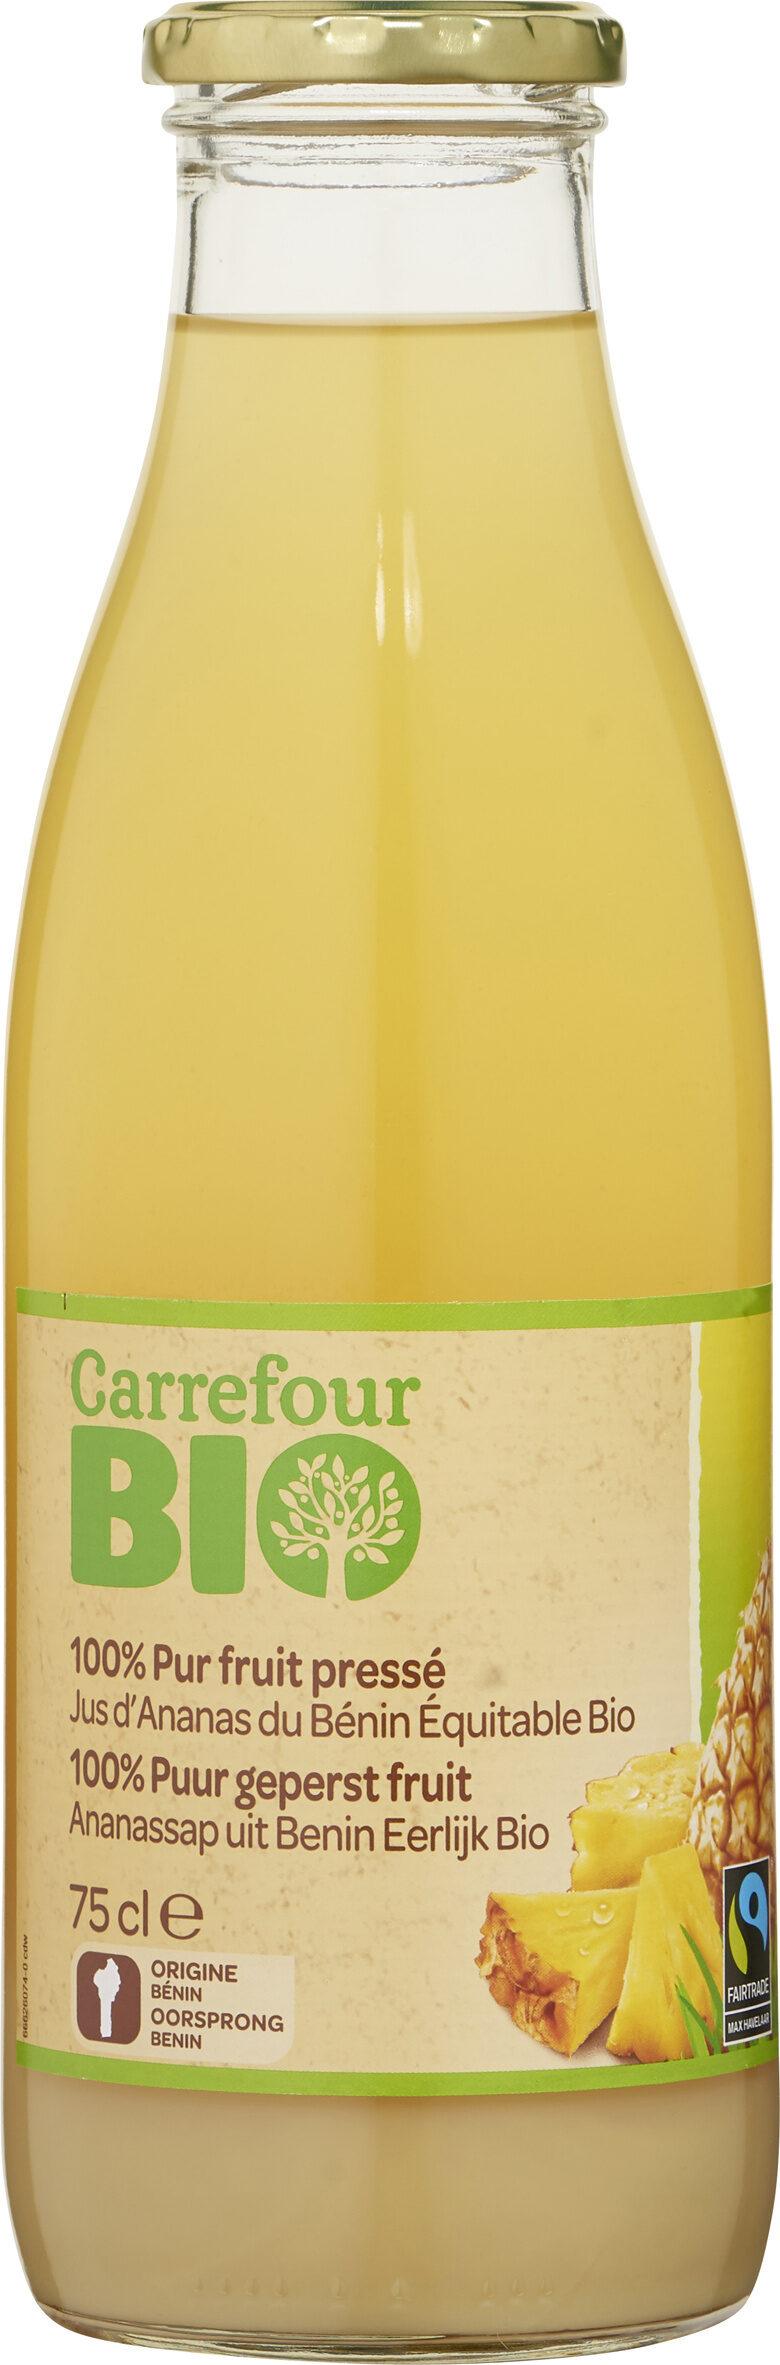 100% Pur fruit pressé Jus d'Ananas du Bénin BIO - Prodotto - fr